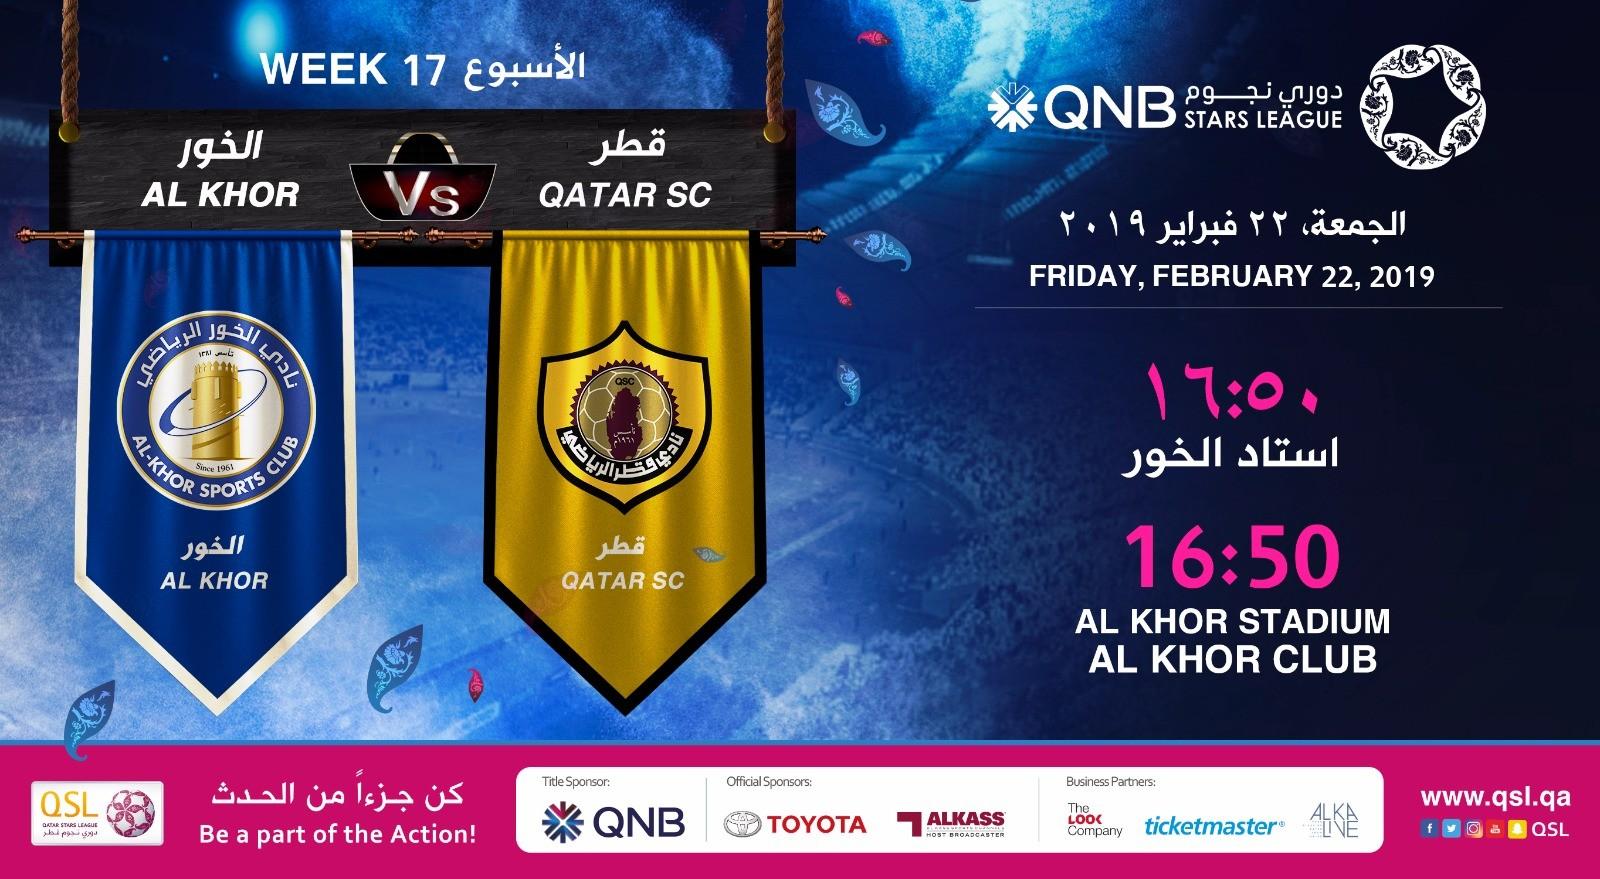 QNB Stars League Week 17 — Al Khor vs Qatar SC